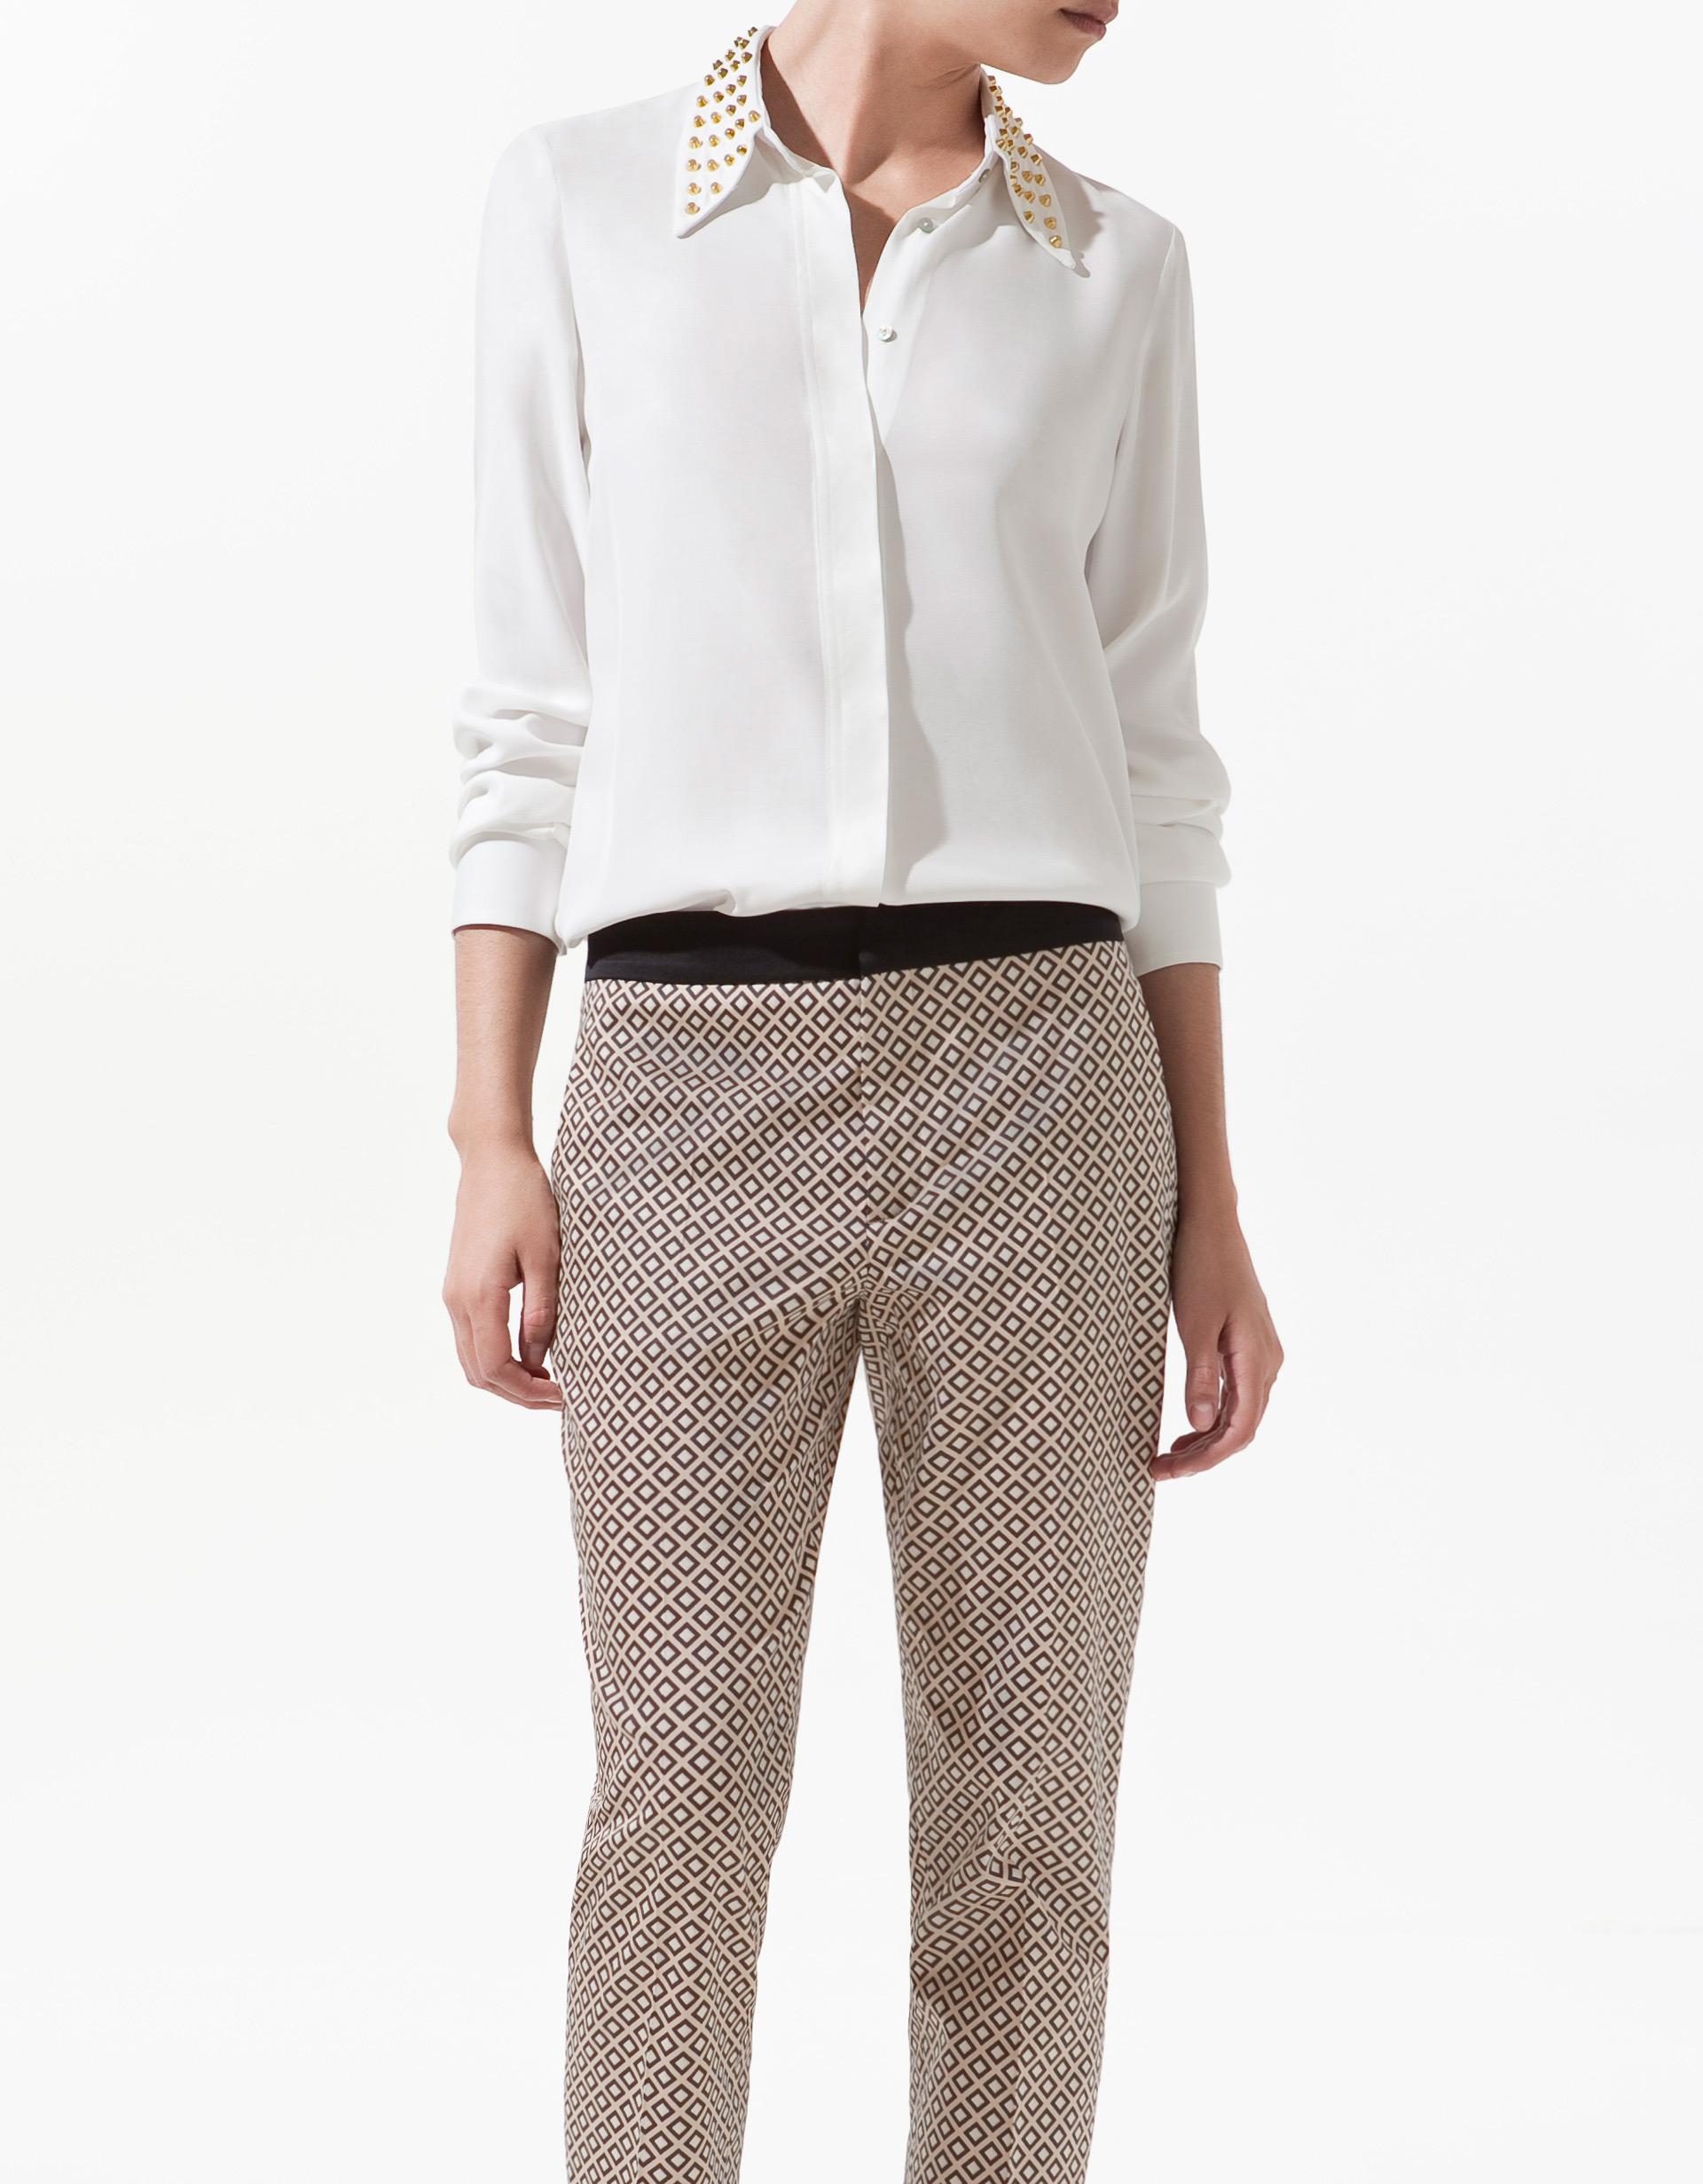 Zara White Studded Blouse 48